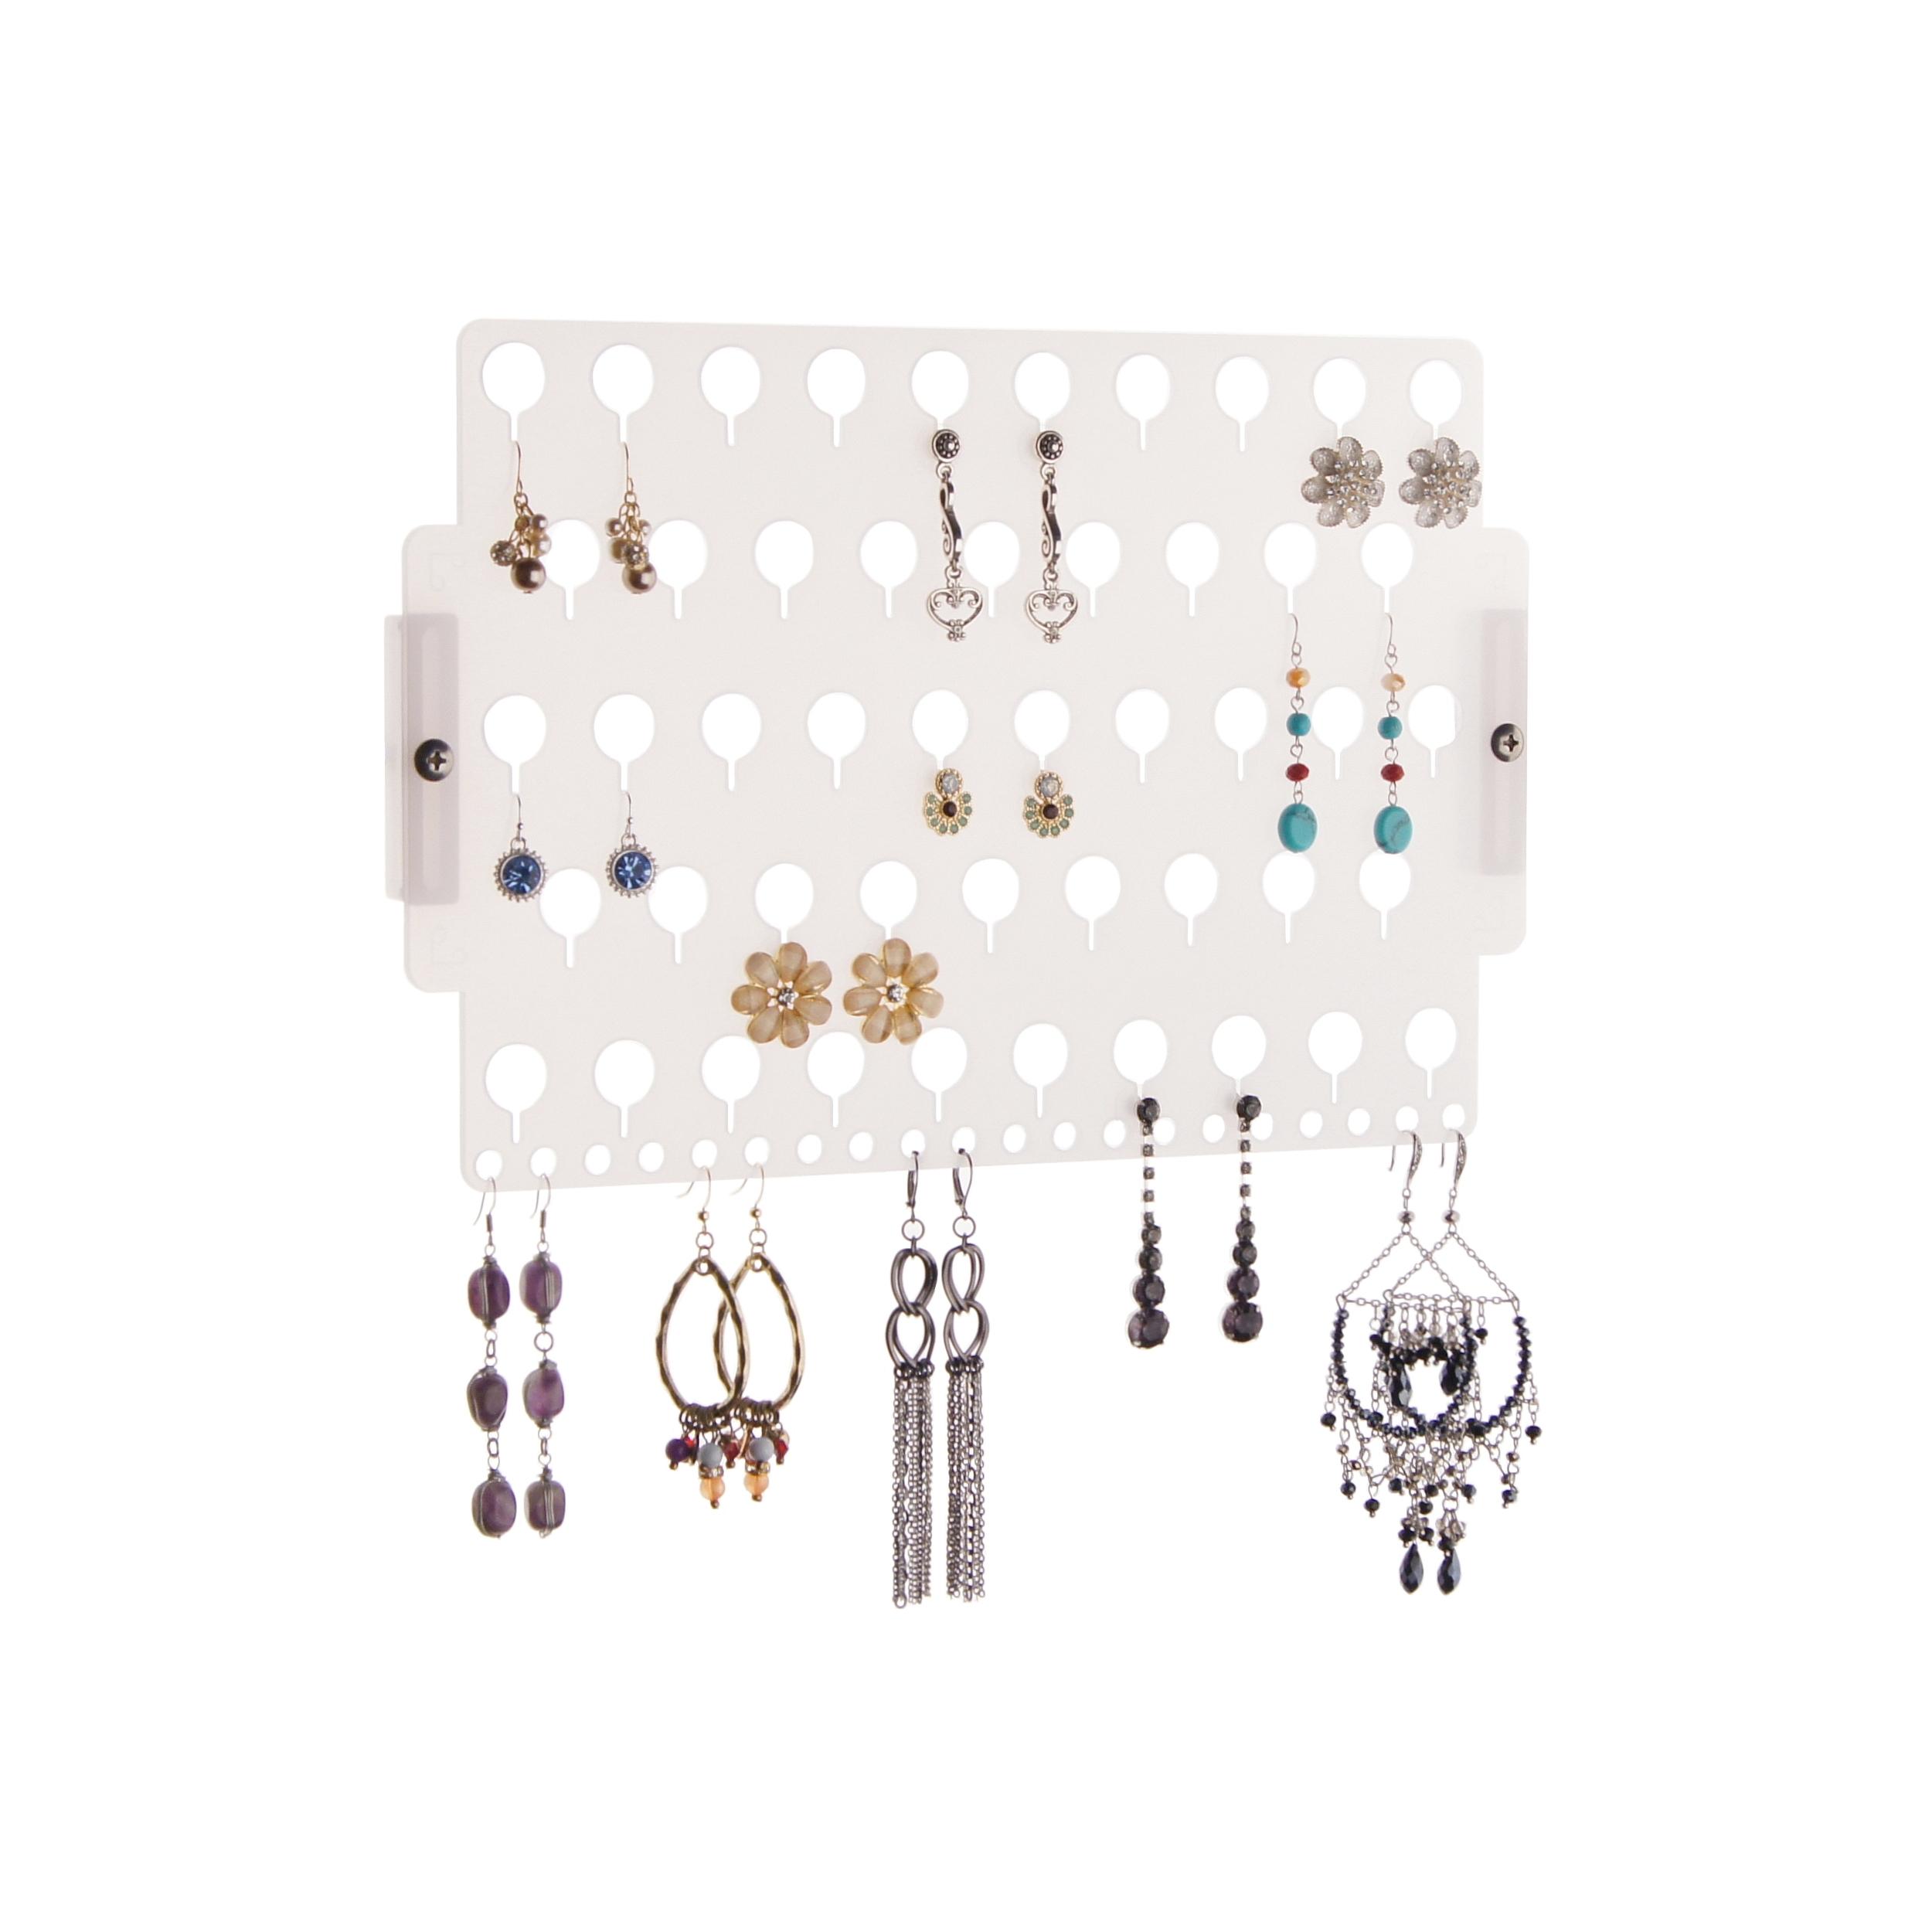 Angelynn S Wall Mount Stud Earring Holder Hanging Jewelry Organizer Rack Closet Storage Earring Angel Frosted Walmart Com Walmart Com